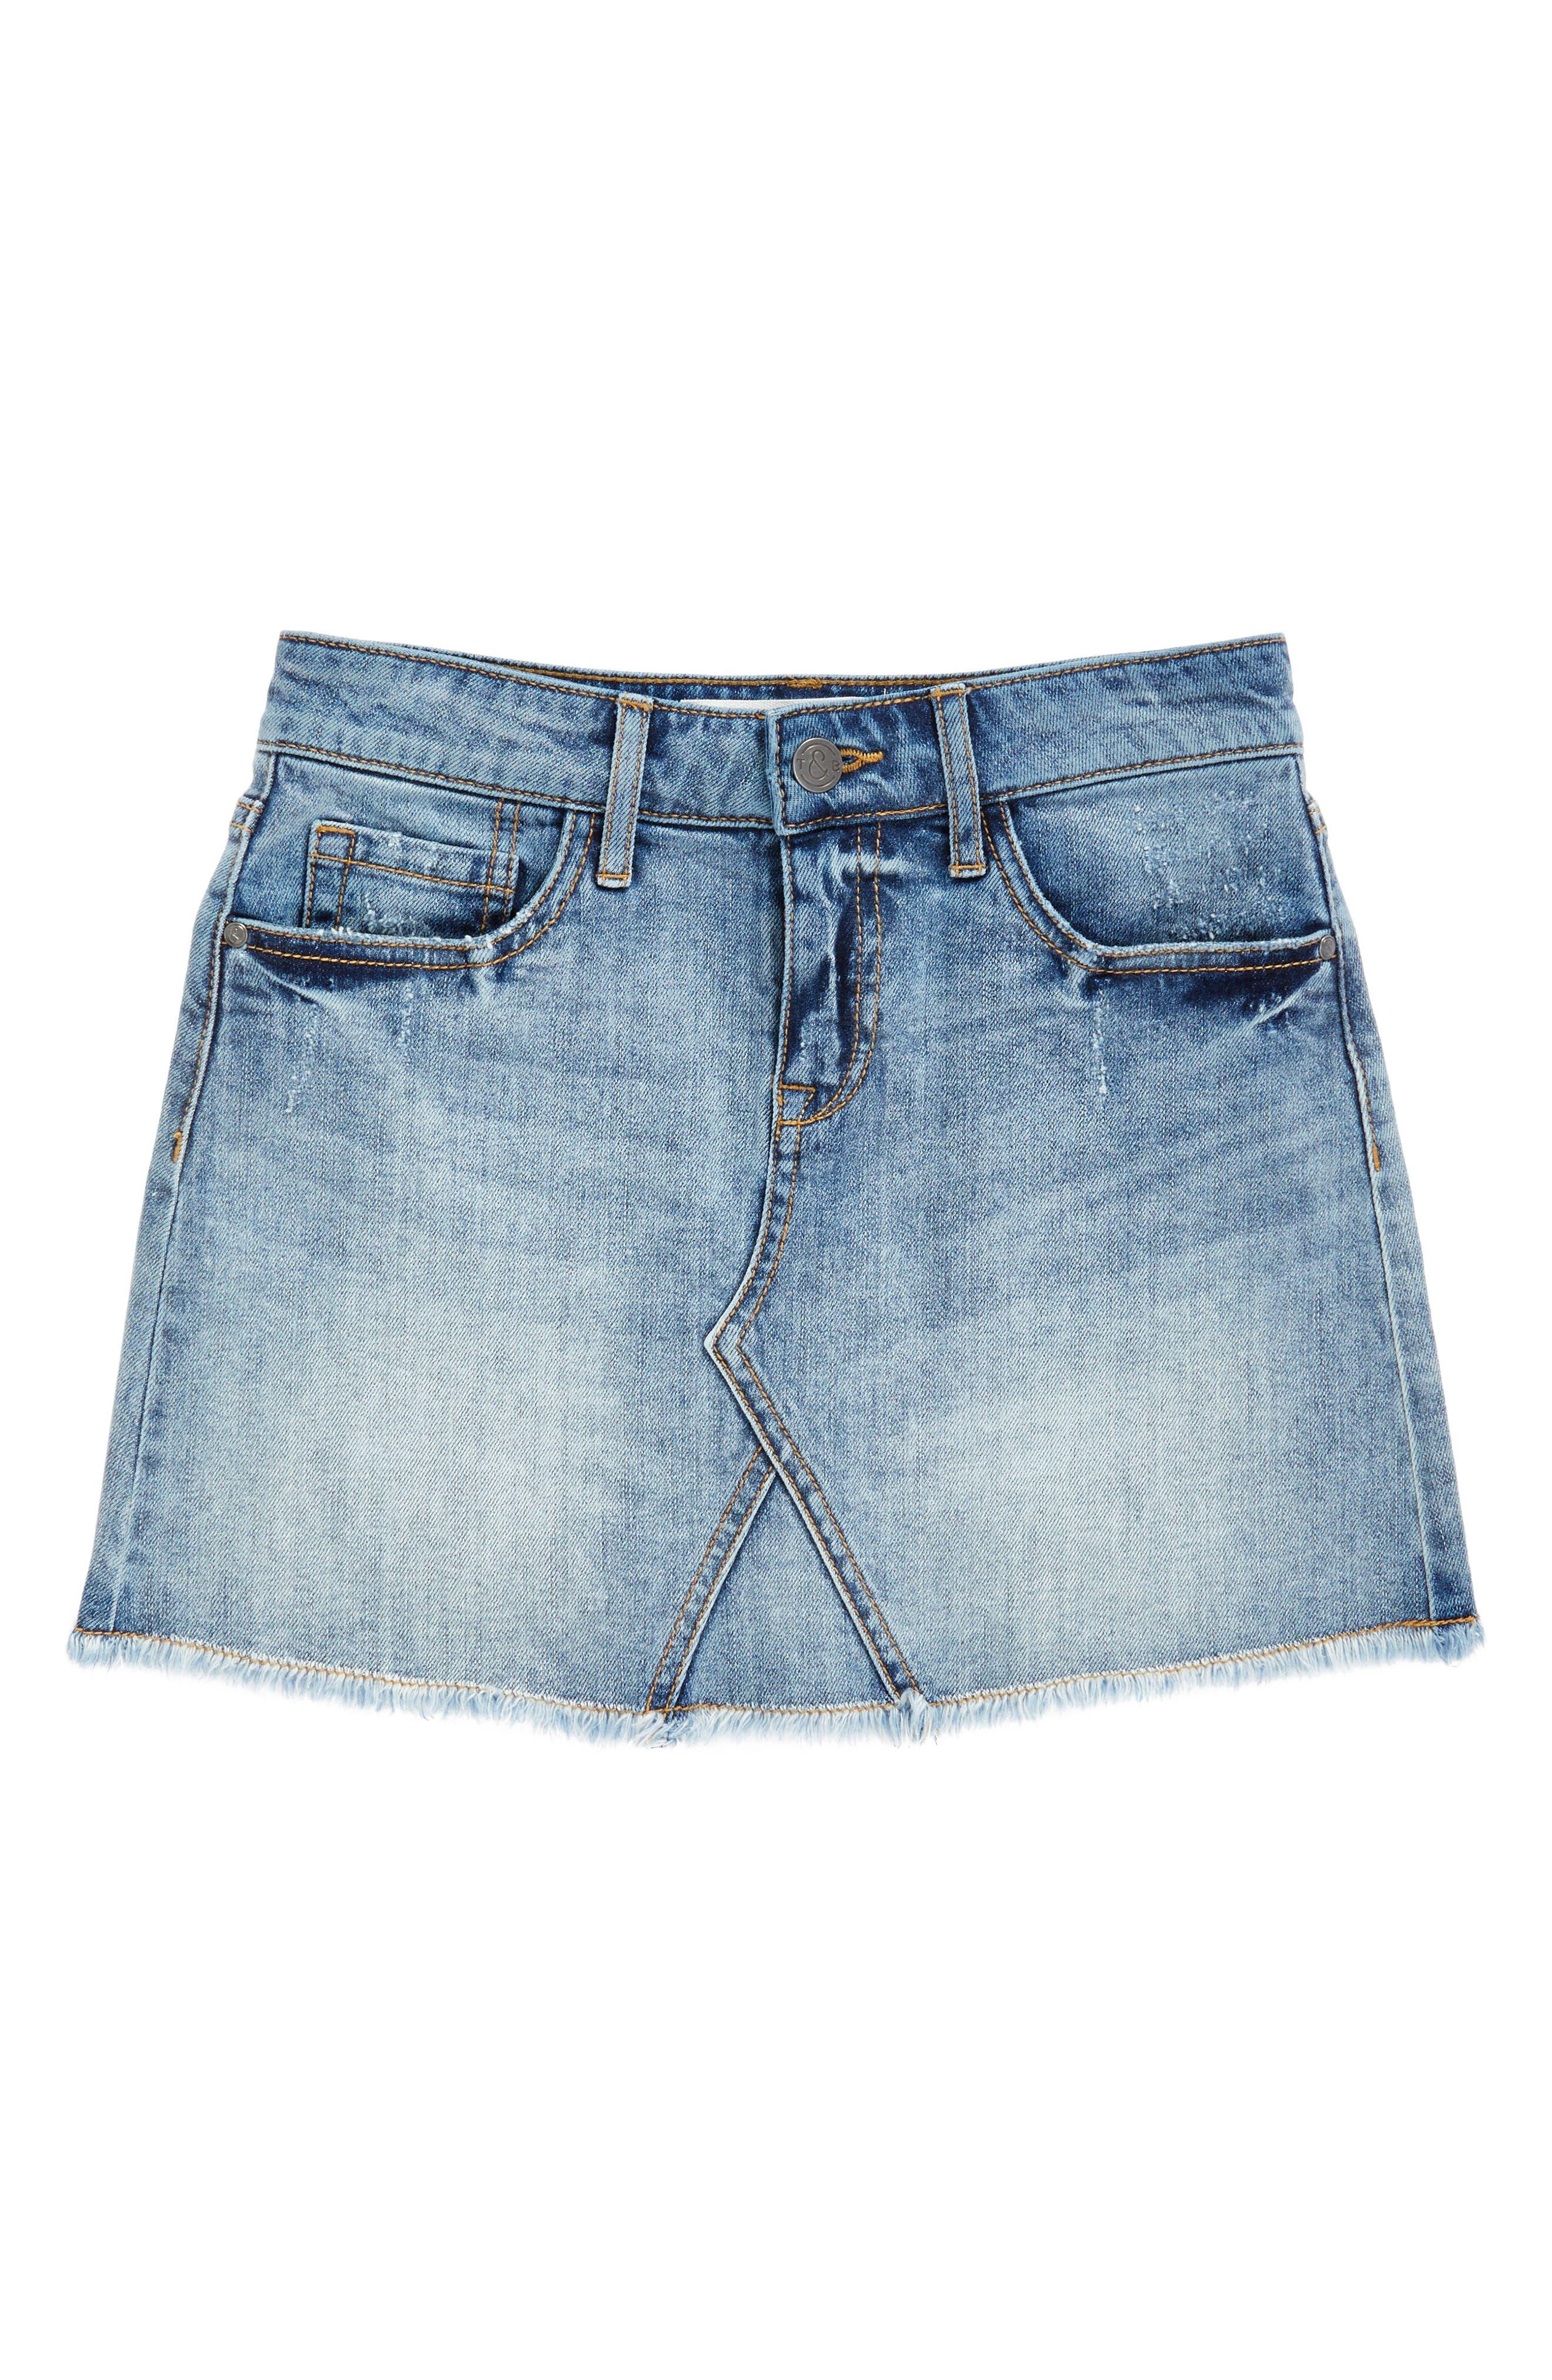 Cutoff Denim Skirt,                             Main thumbnail 1, color,                             420